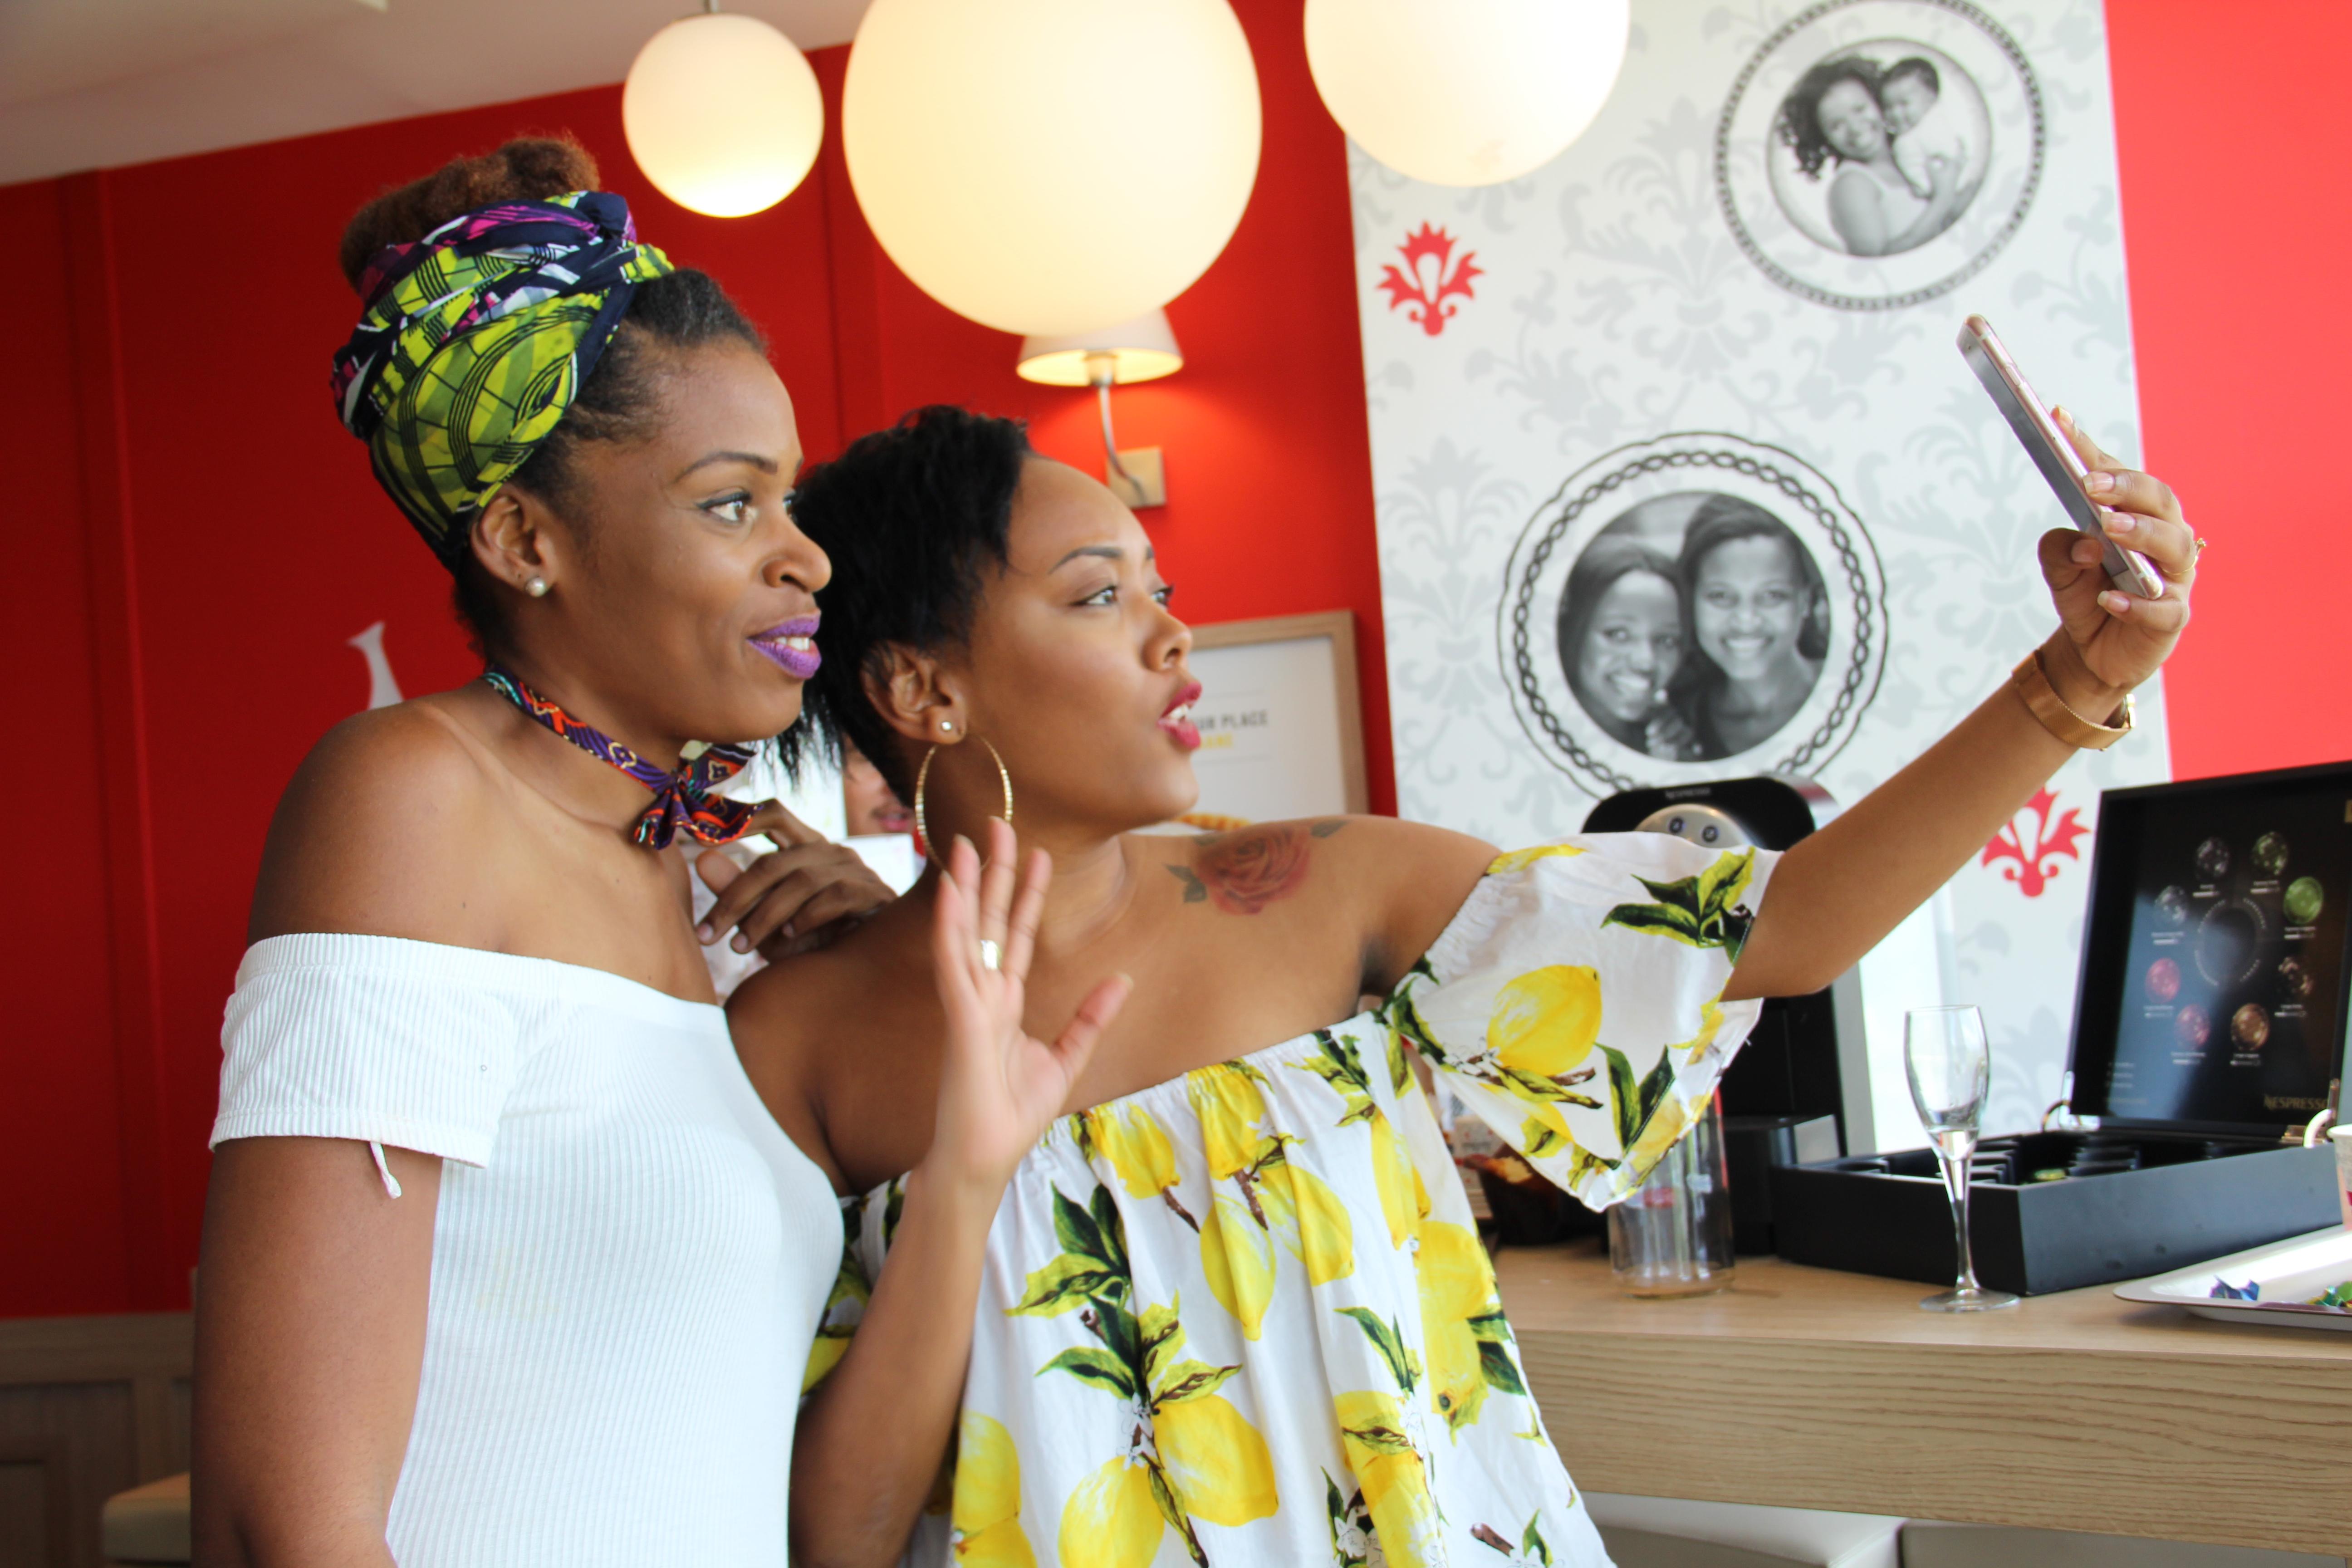 relations-blogueurs-influenceurs-locaux-guadeloupe-martinique-influenceurs-snap-instagram-facebook